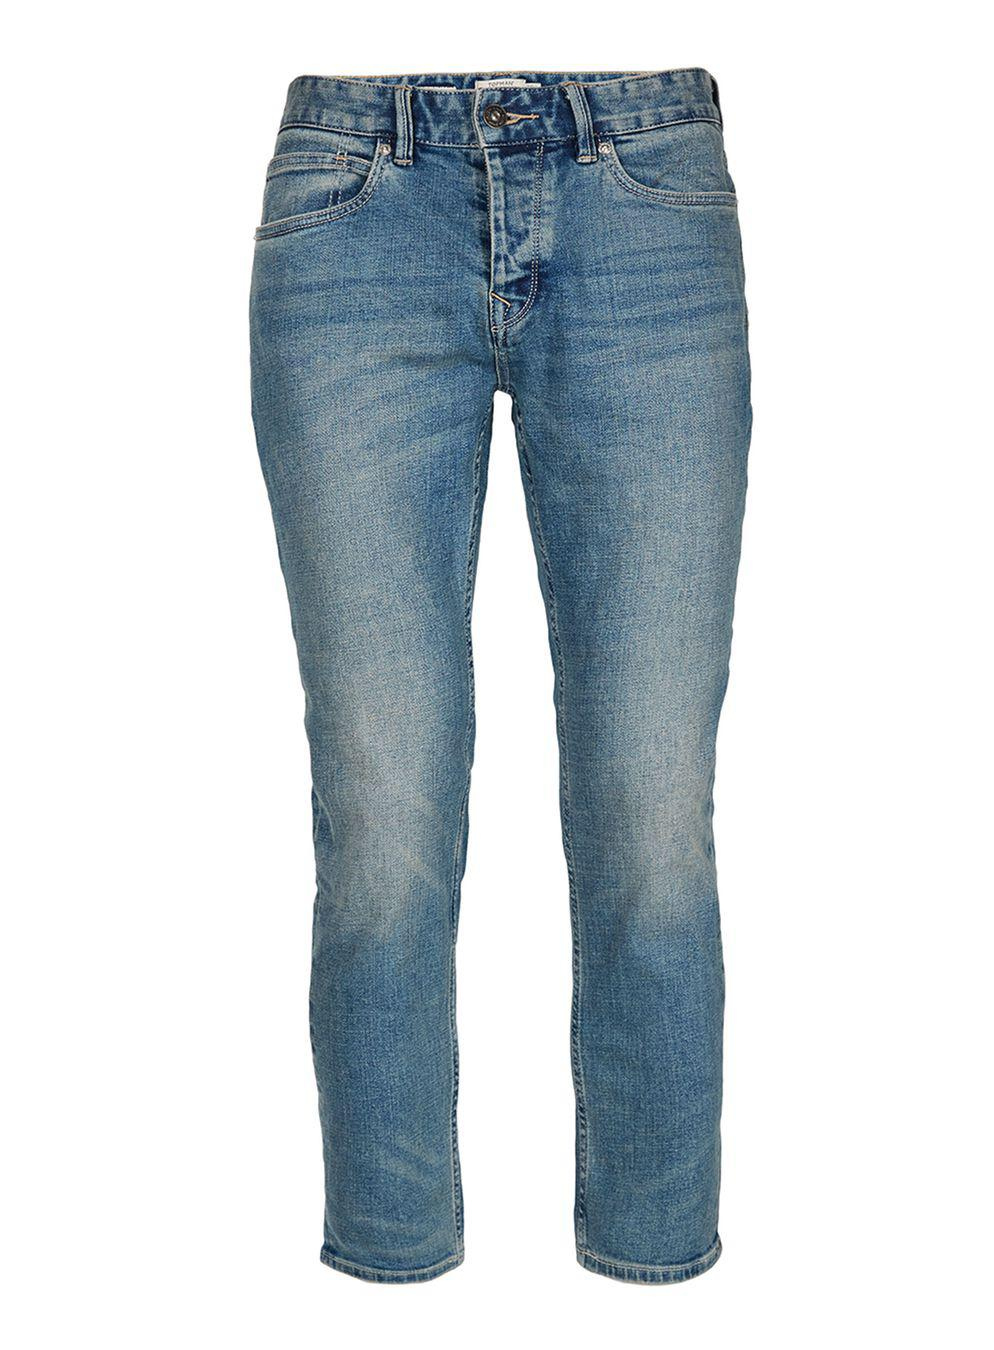 TOPMAN Denim Blue Cropped Stretch Slim Jean for Men